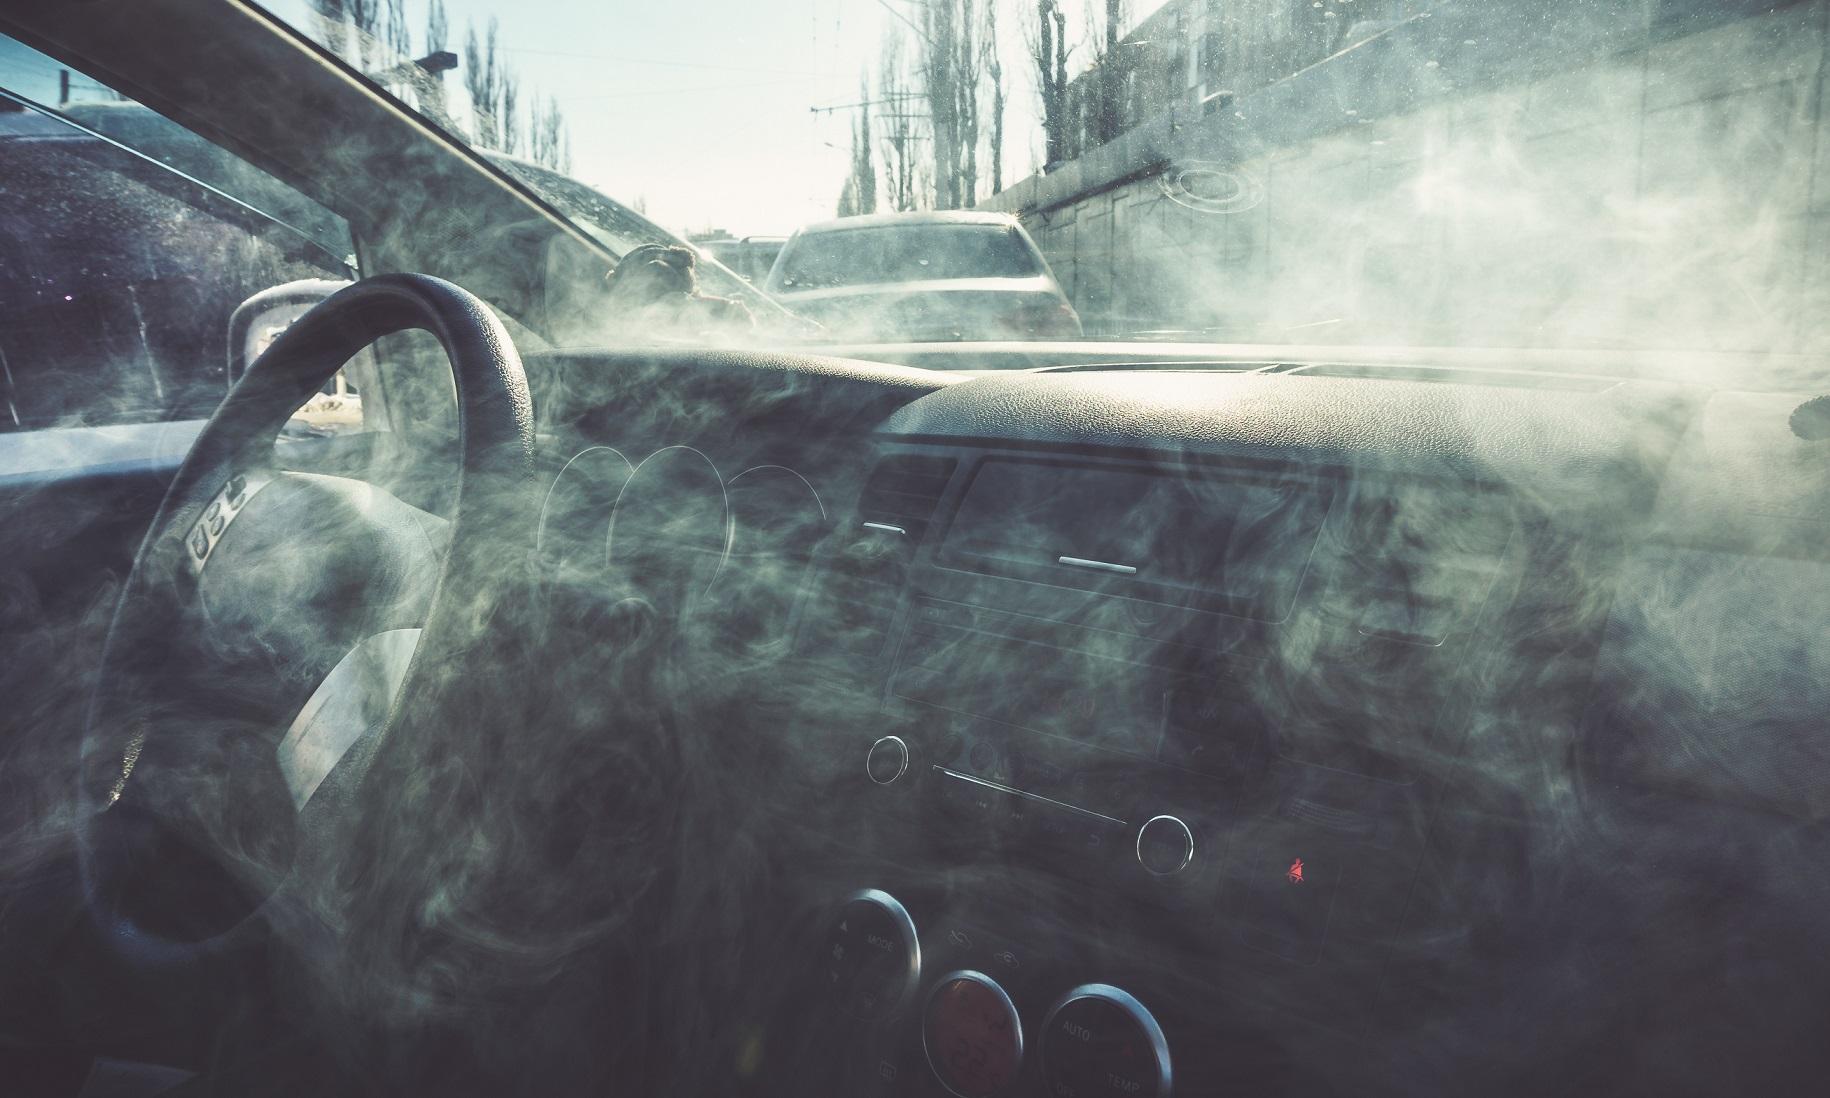 gas fumaca dentro da cabine carro